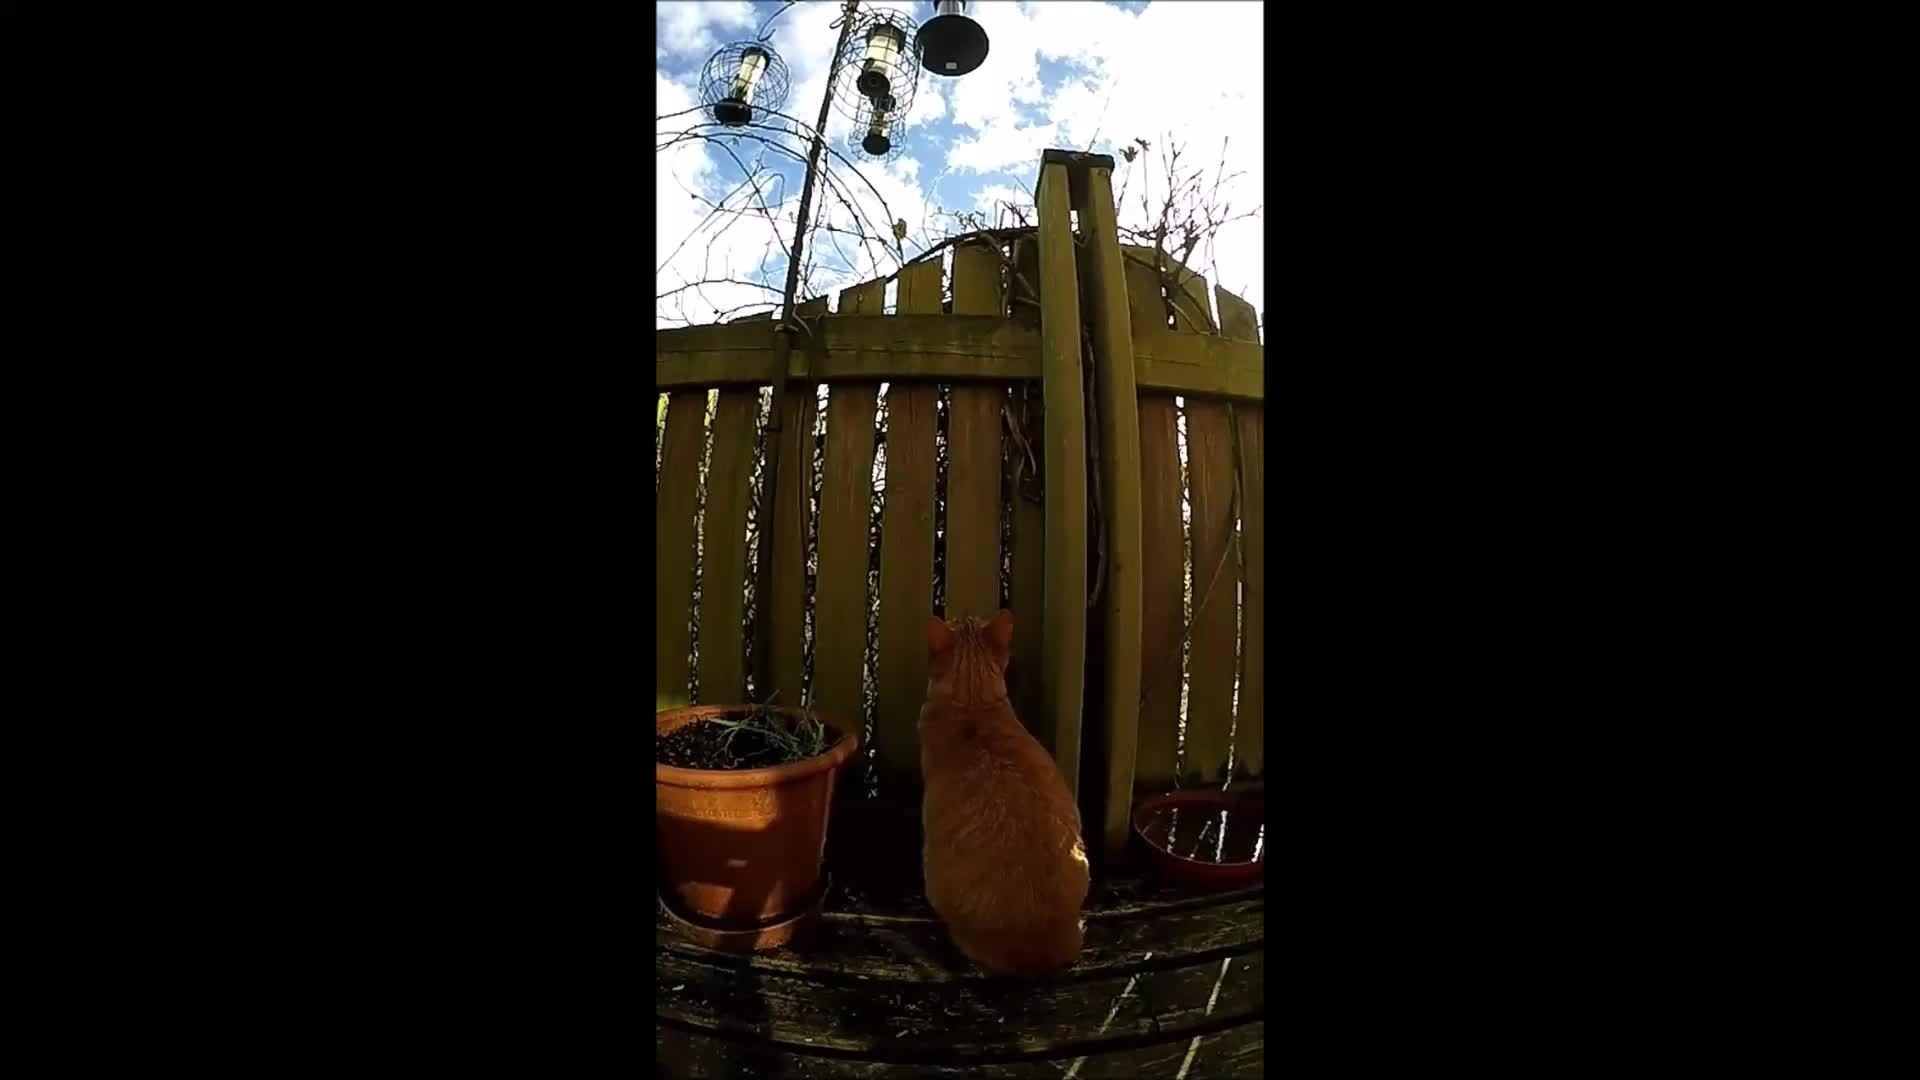 natureismetal, woahdude, My cat getting primal (reddit) GIFs